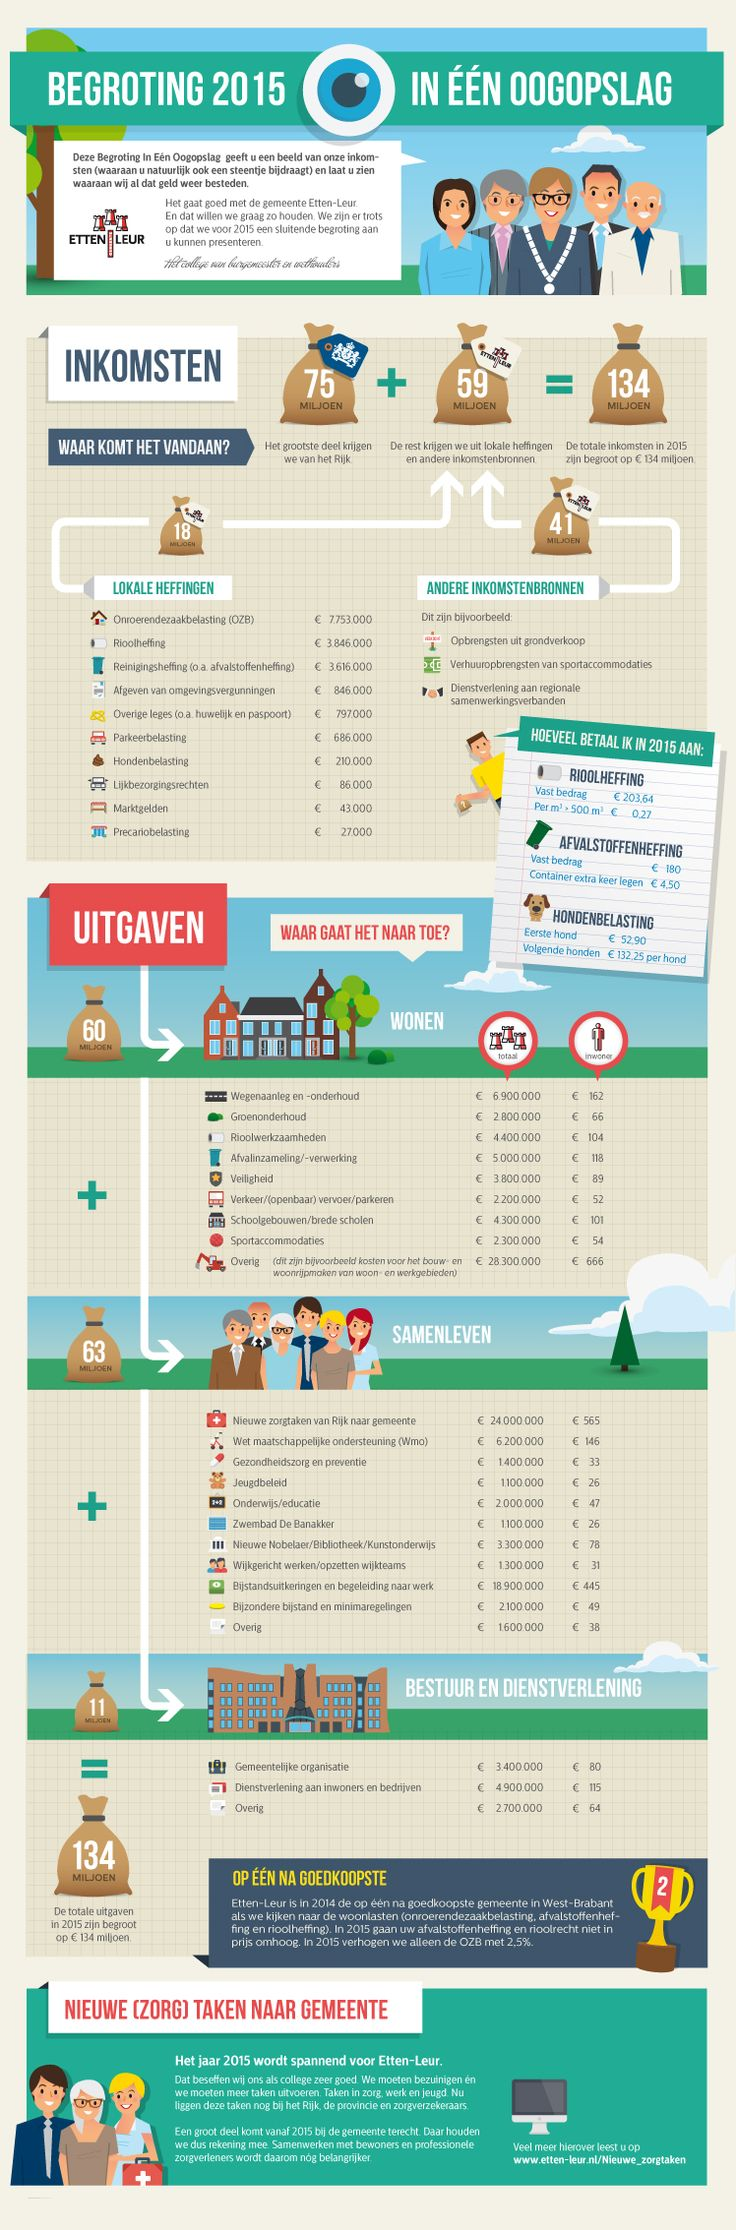 Begroting Etten-Leur 2015 in één oogopslag